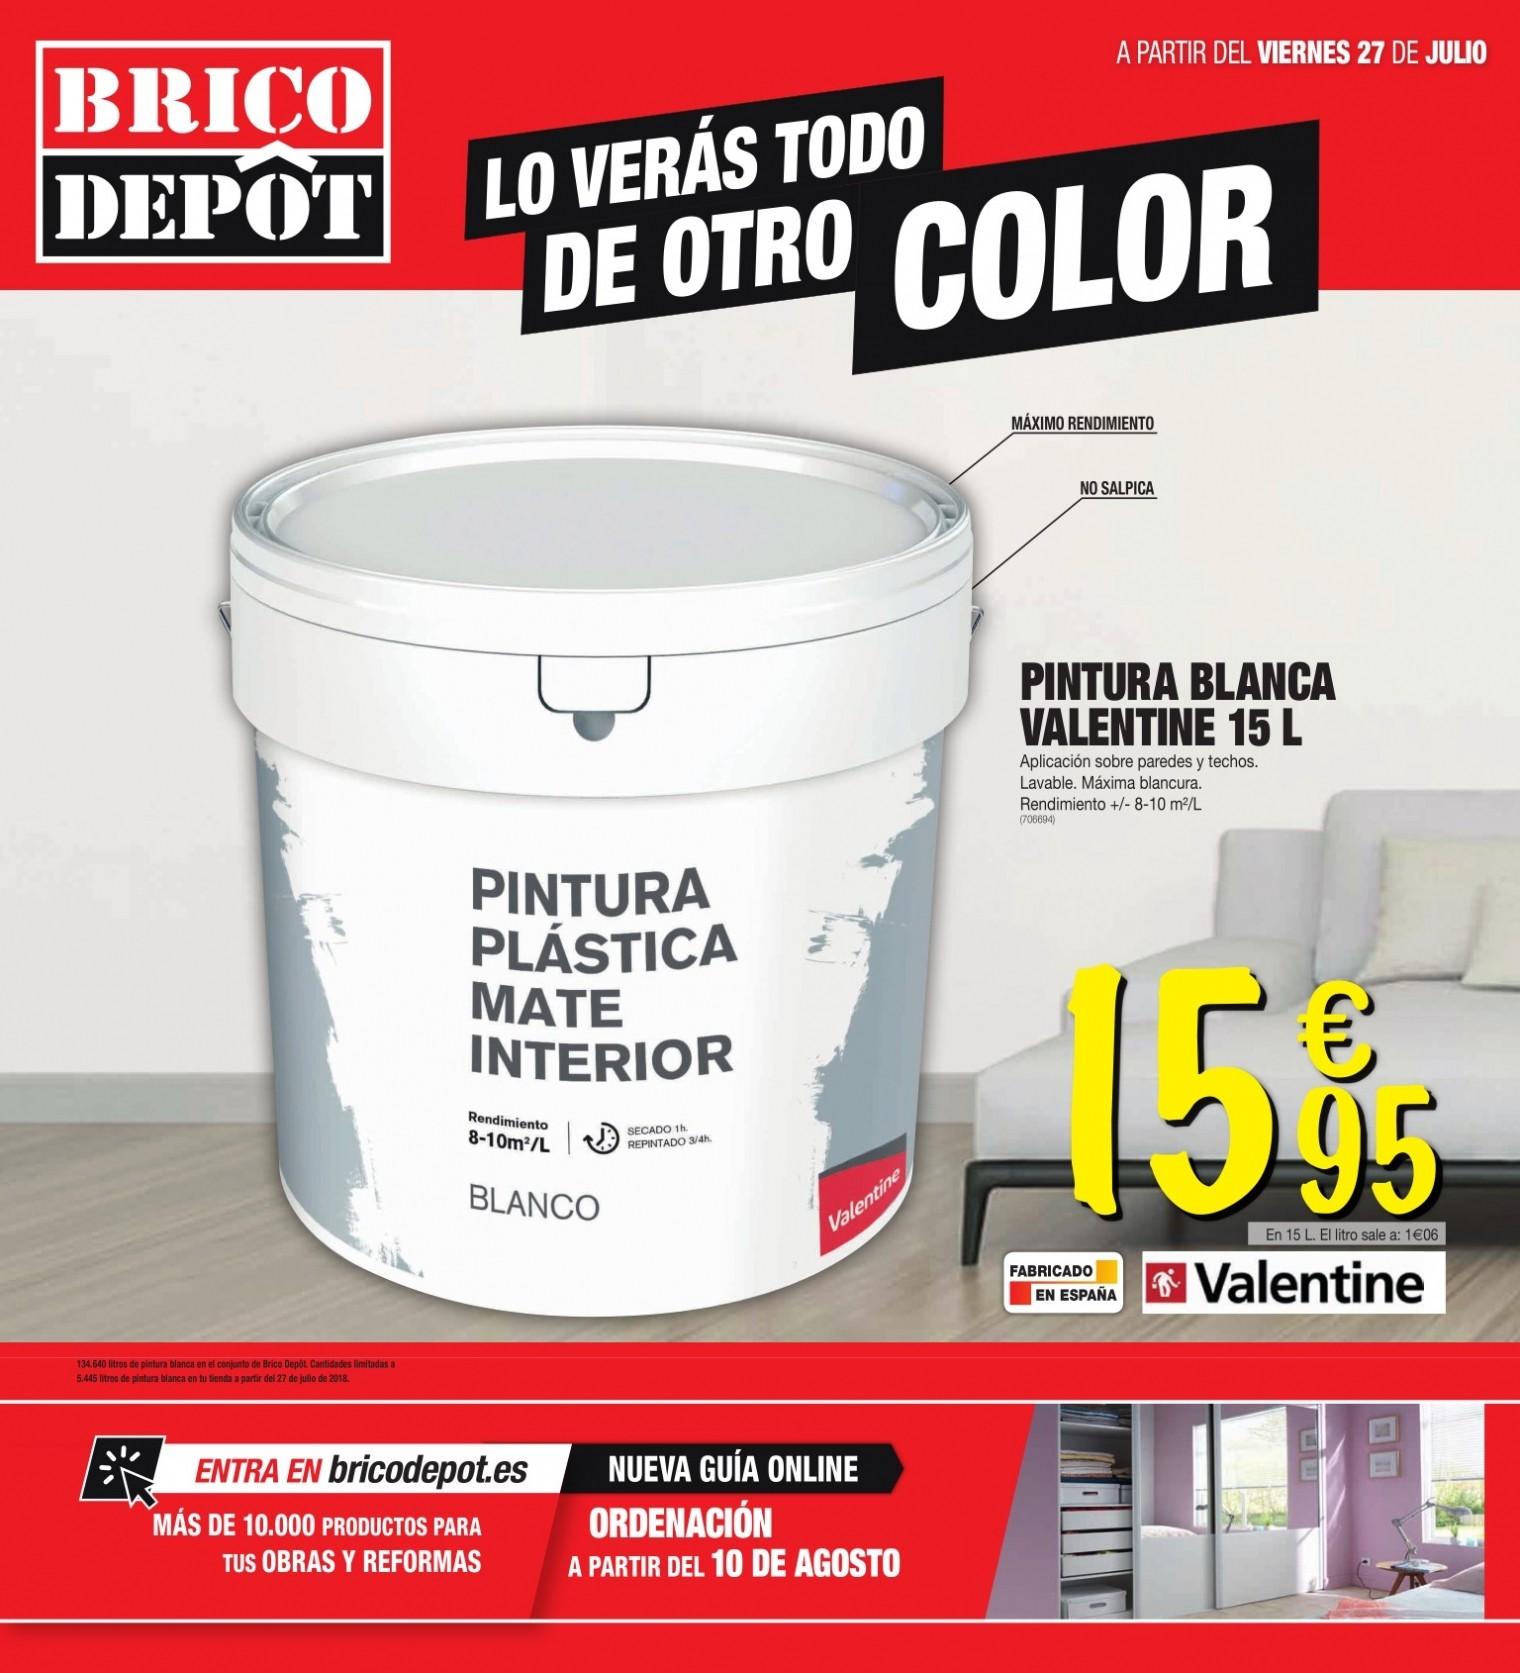 affordable termo electrico 80 litros brico depot with termo electrico 80 litros brico depot